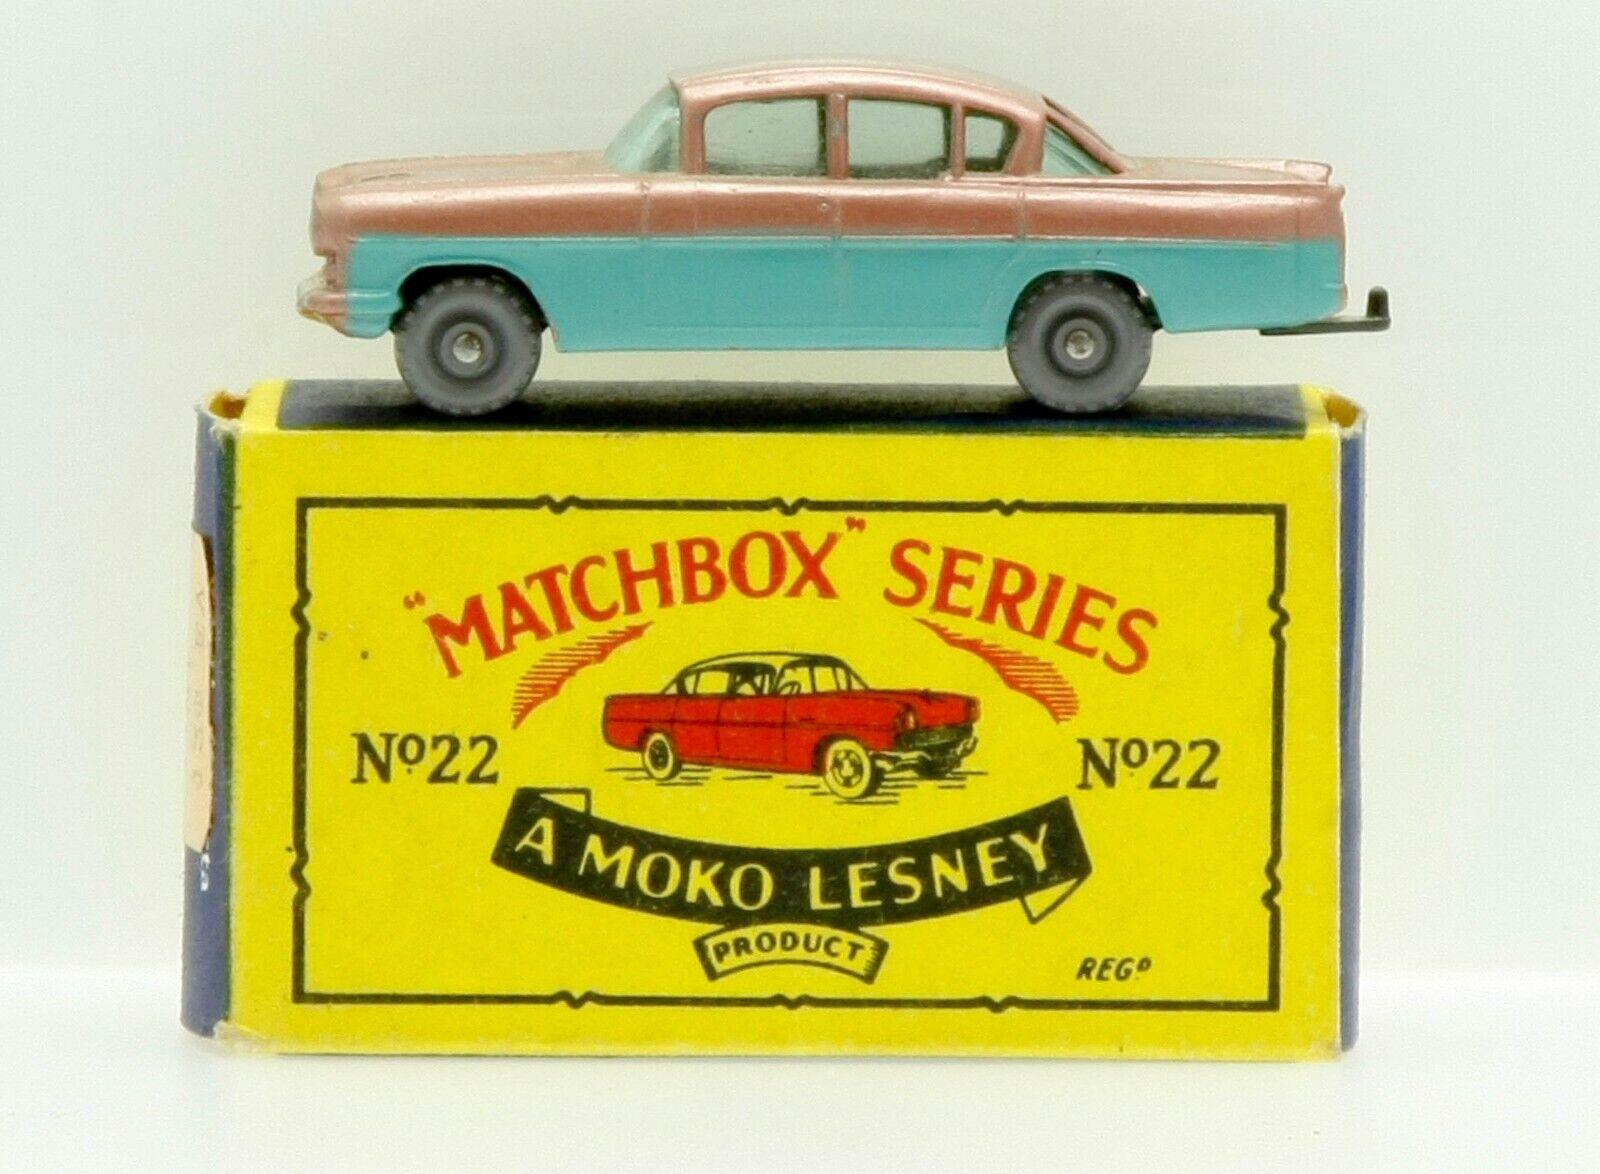 New Matchbox Moko Lesney No.22  Vauxhall Cresta  Original Box 1950s Diecast